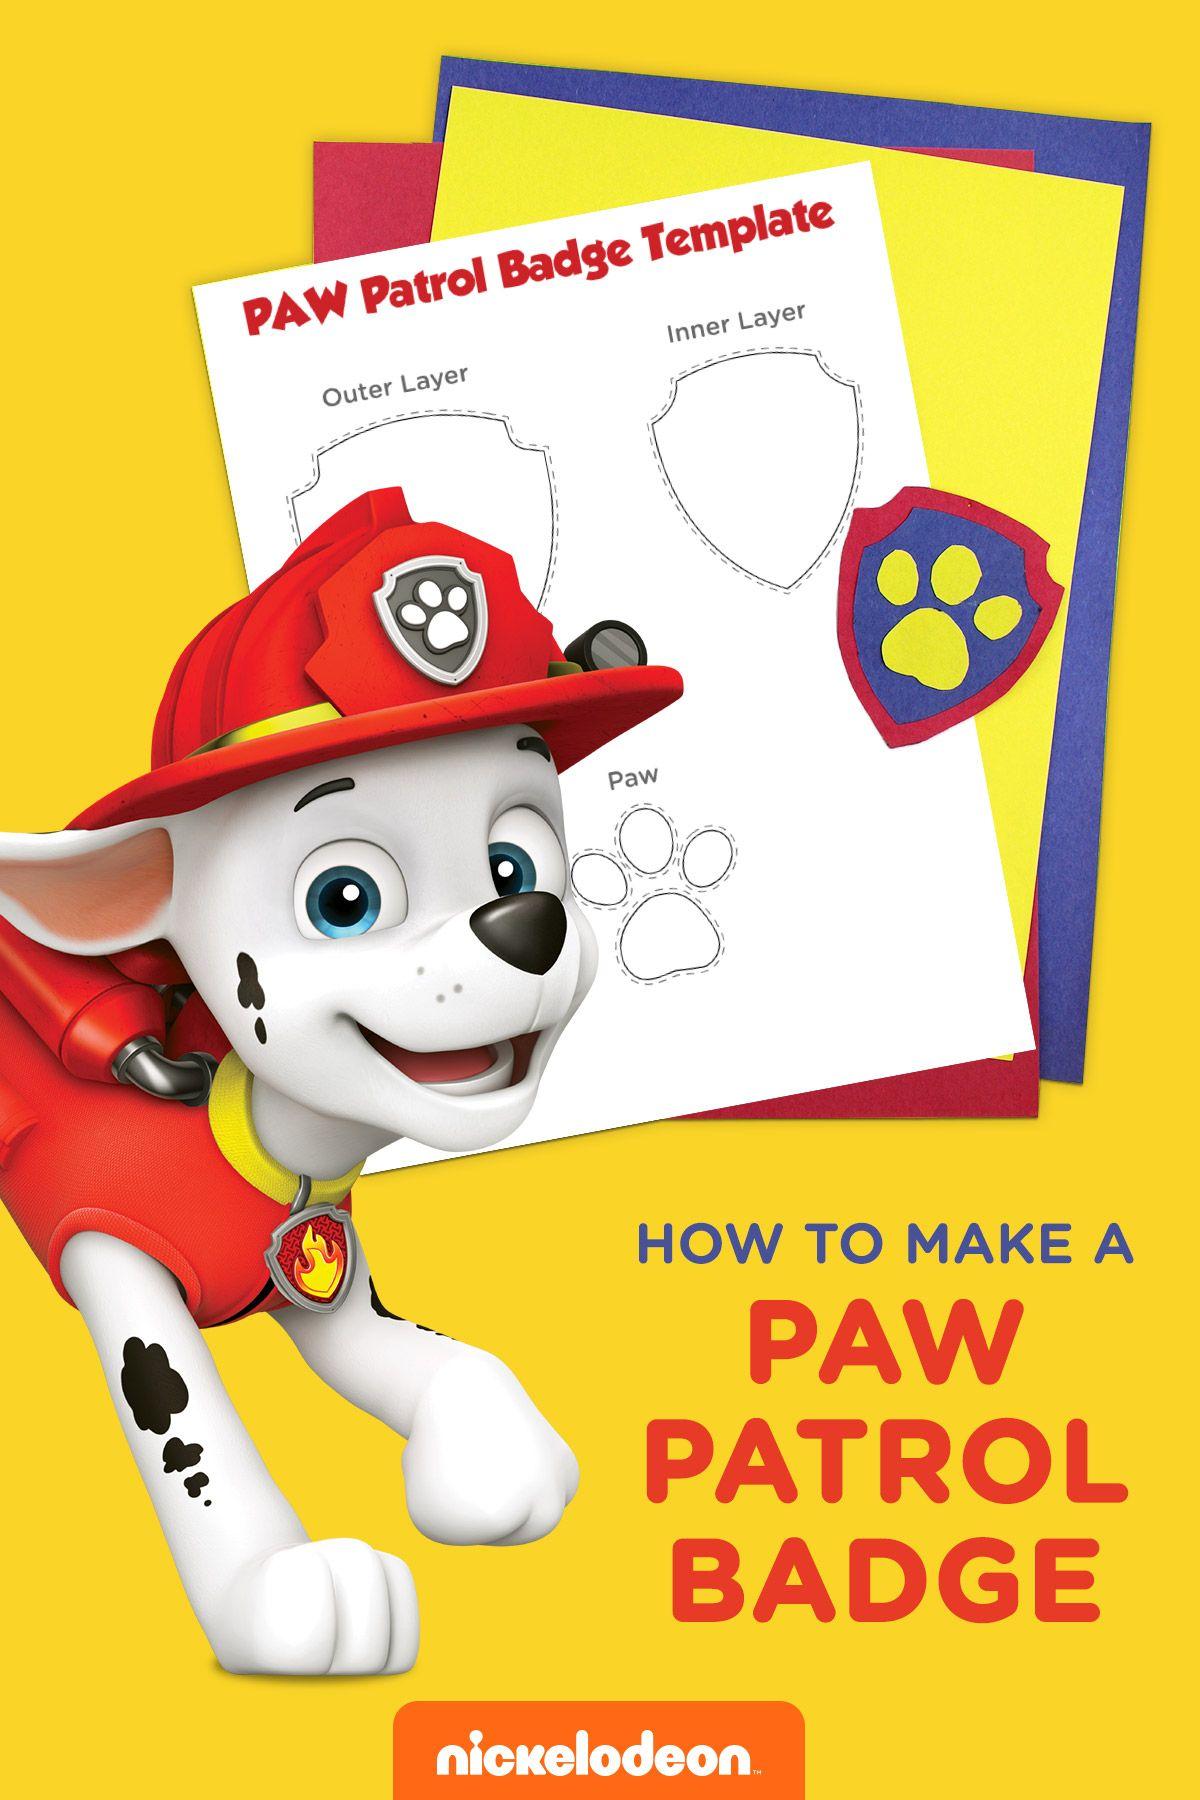 PAW Patrol Printable Badge Template